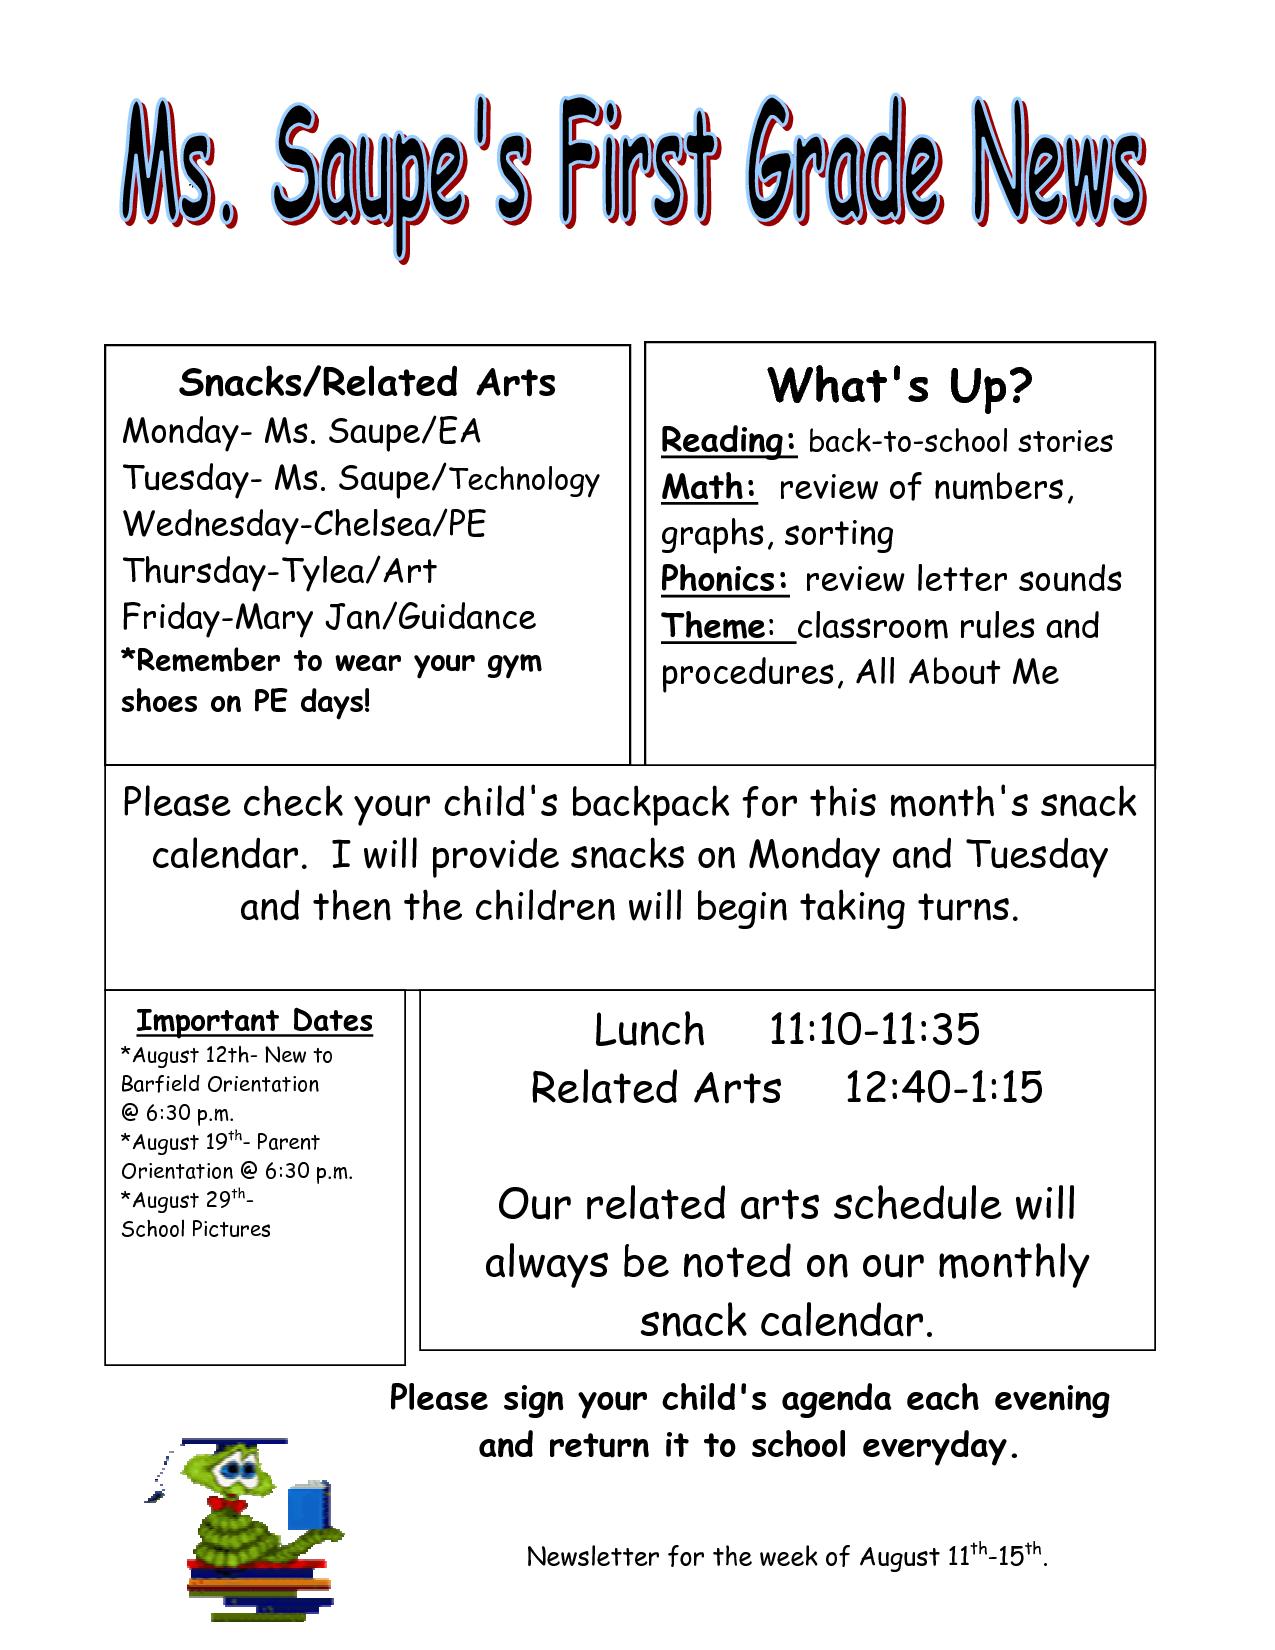 Download Newsletter Templates For Teachers Weekly Newsletter - Weekly newsletter template